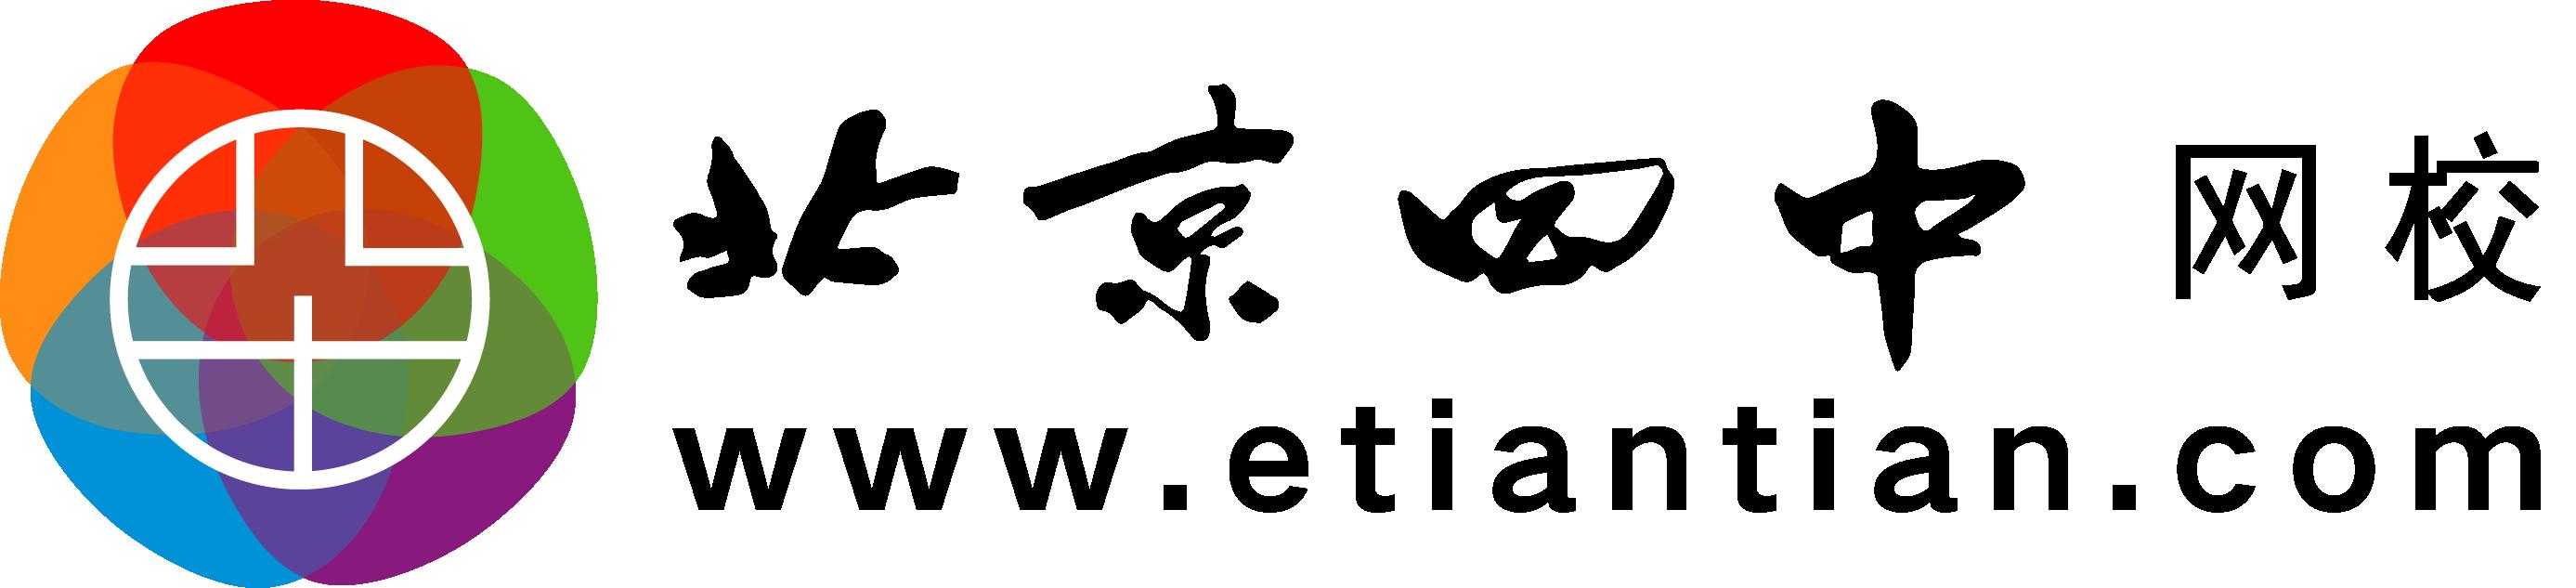 etiantian-logo